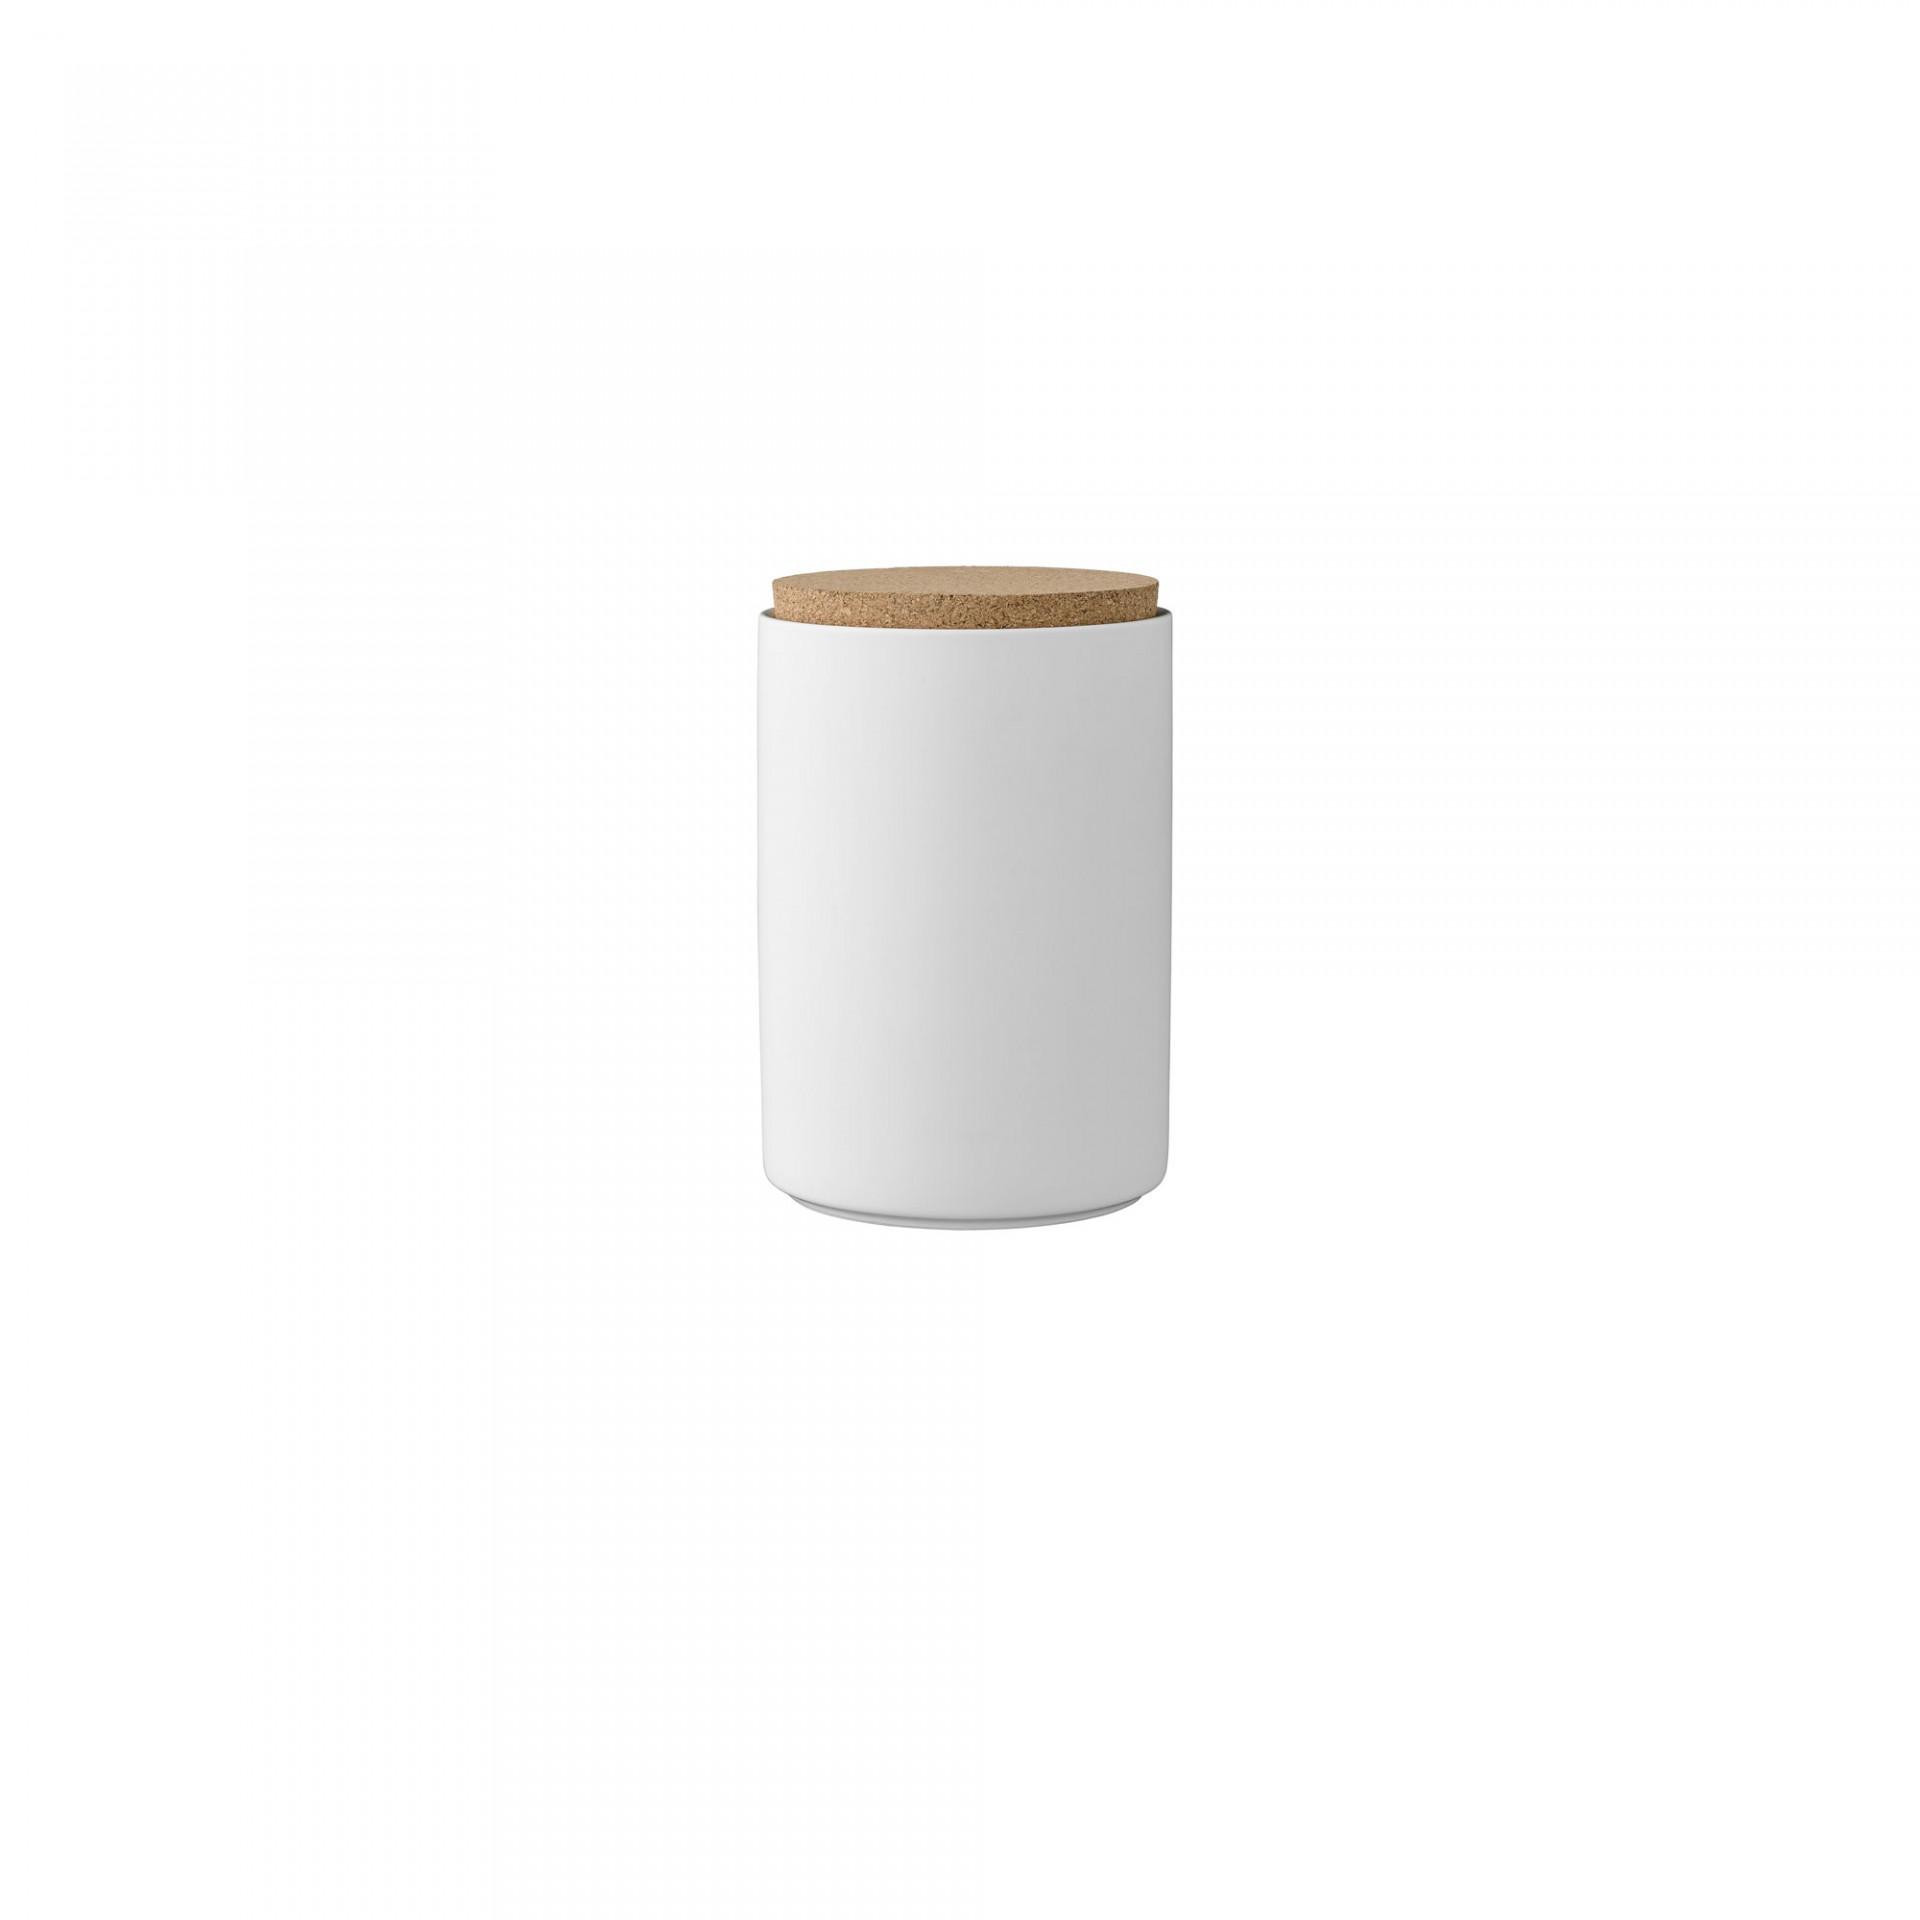 Pote em porcelana c/tampa cortiça, Ø11x16 cm